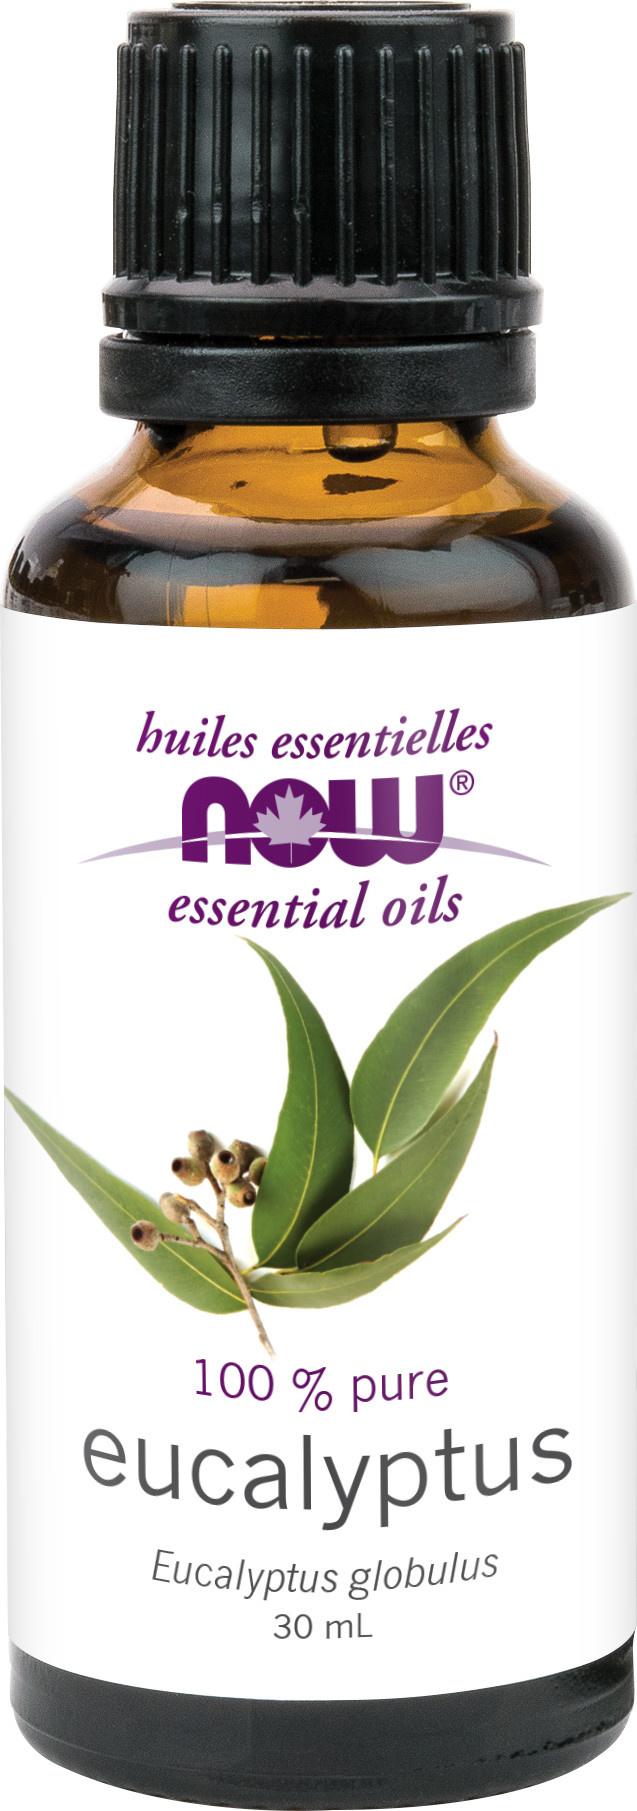 Now Now - Essential Oil - Eucalyptus Oil - 30mL